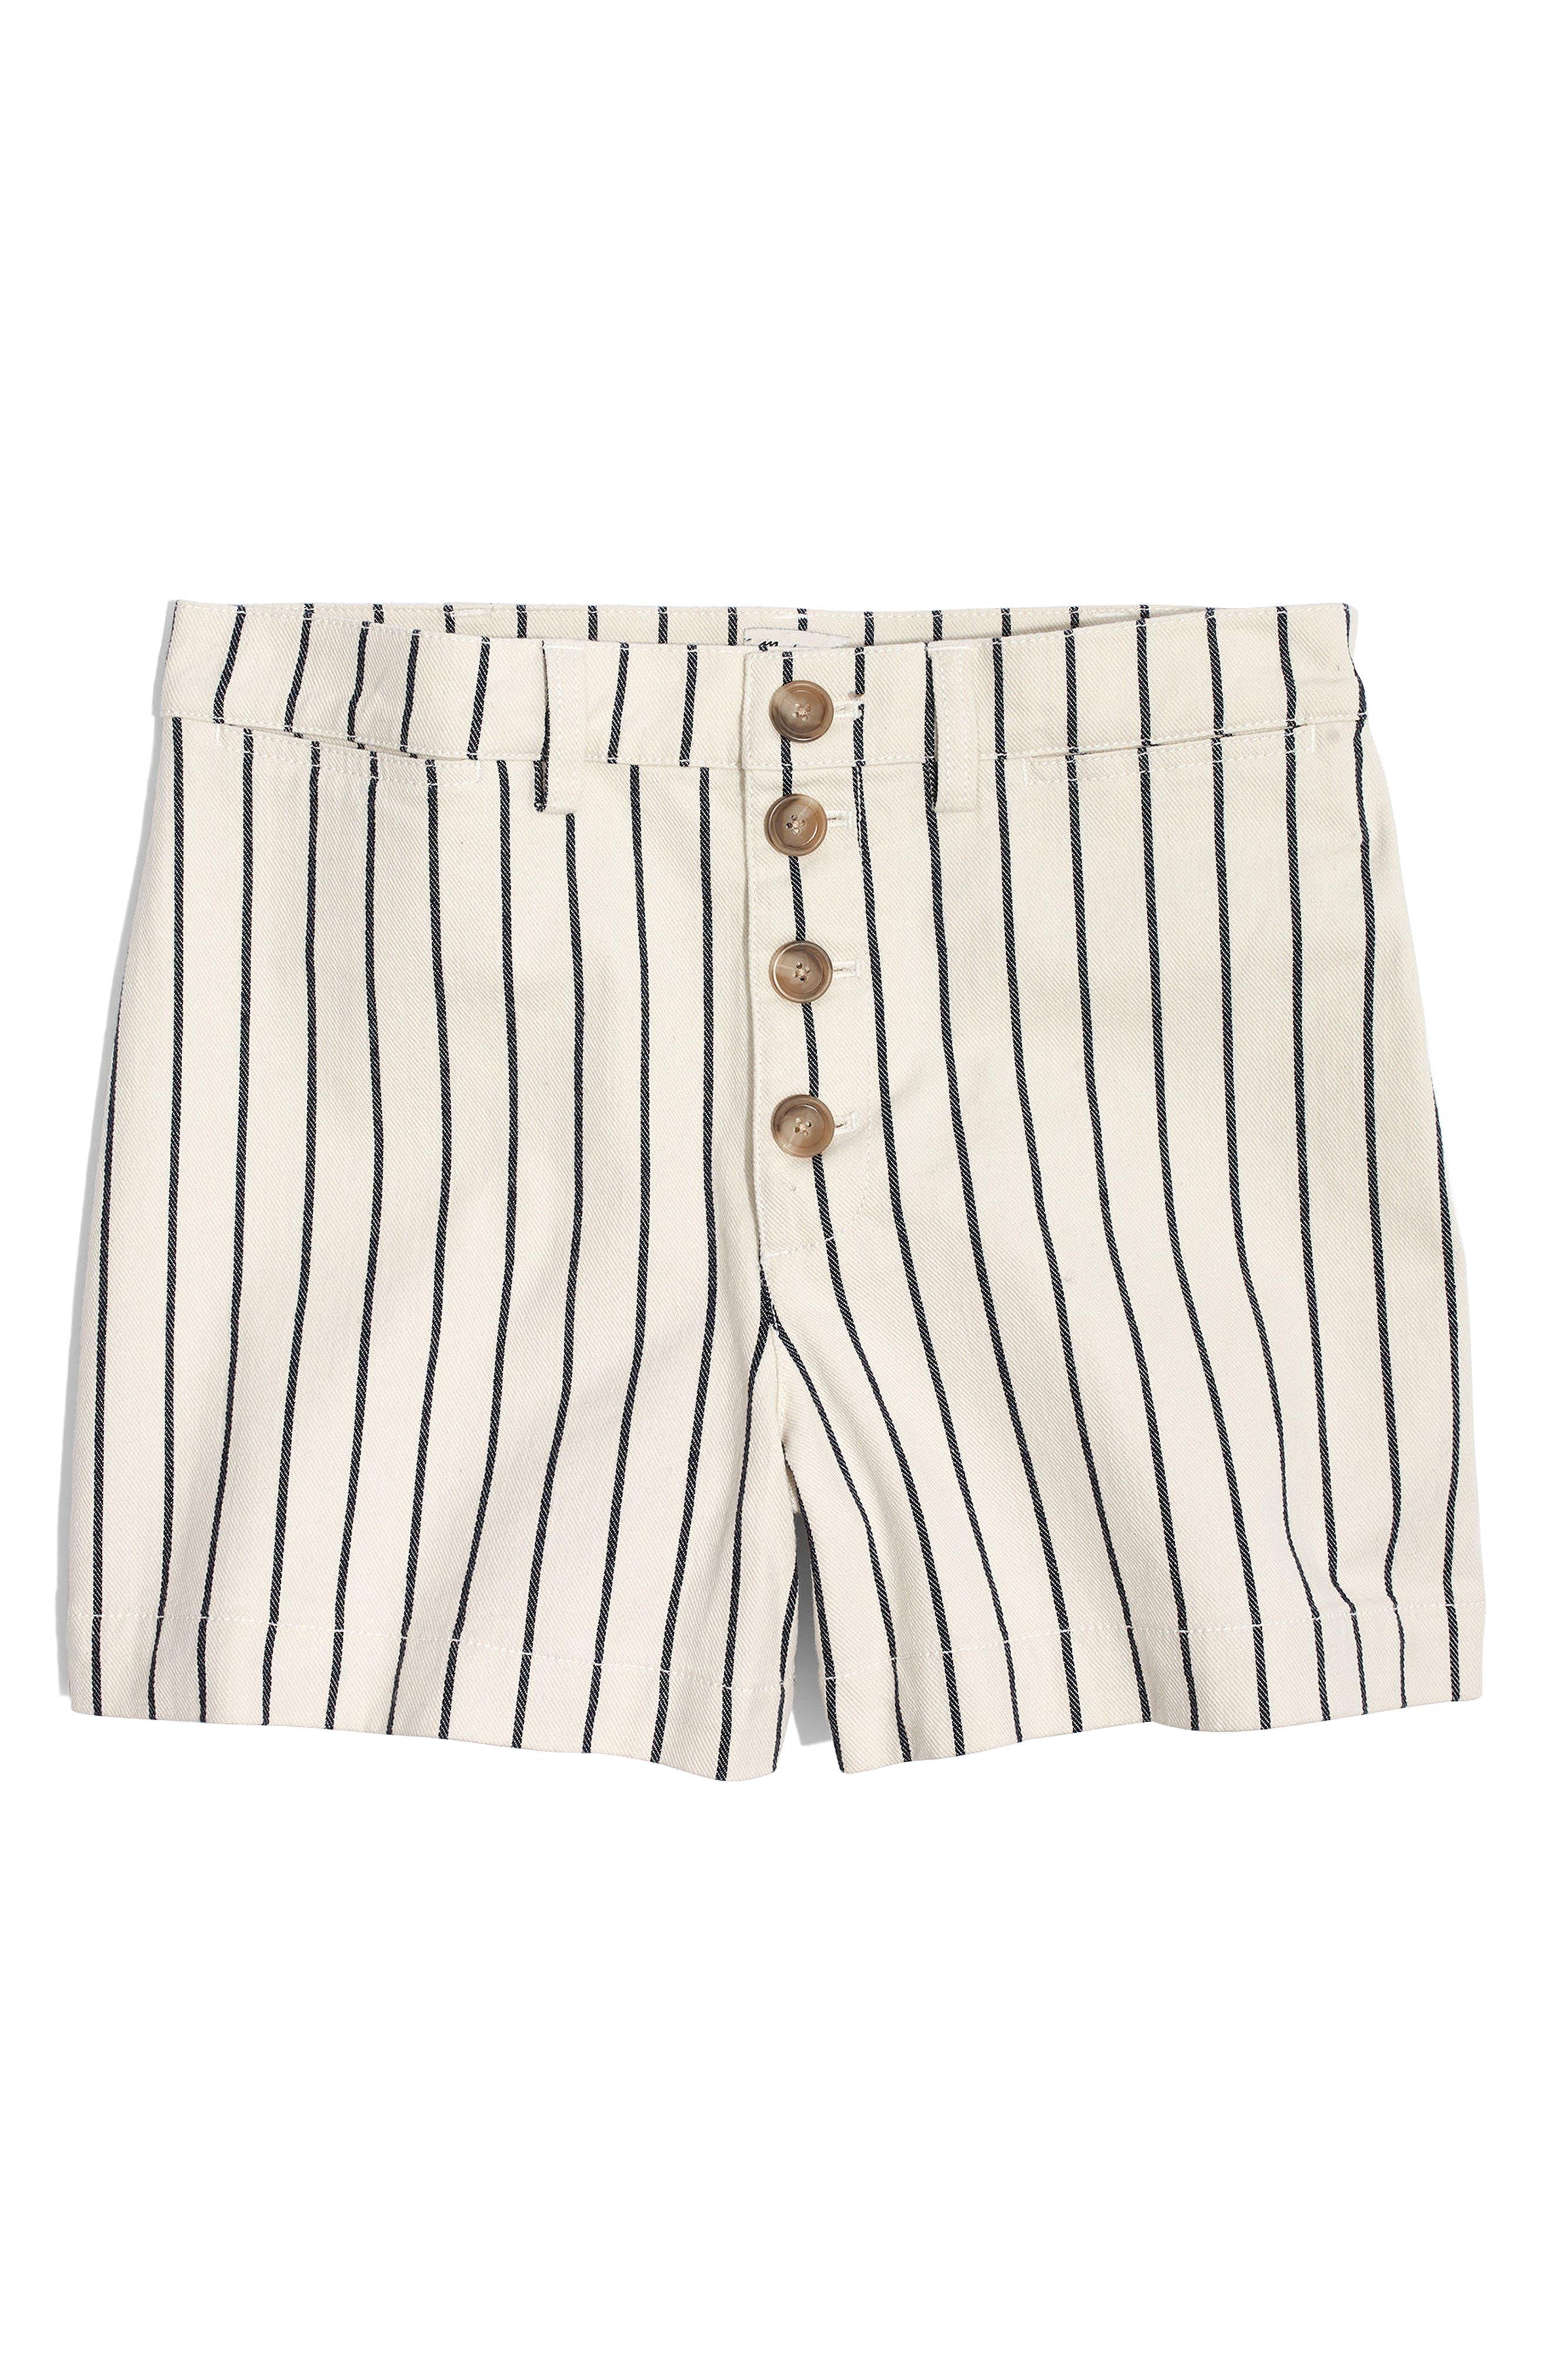 Emmett Stripe Button Front Shorts,                             Alternate thumbnail 3, color,                             Rail Road Stripe